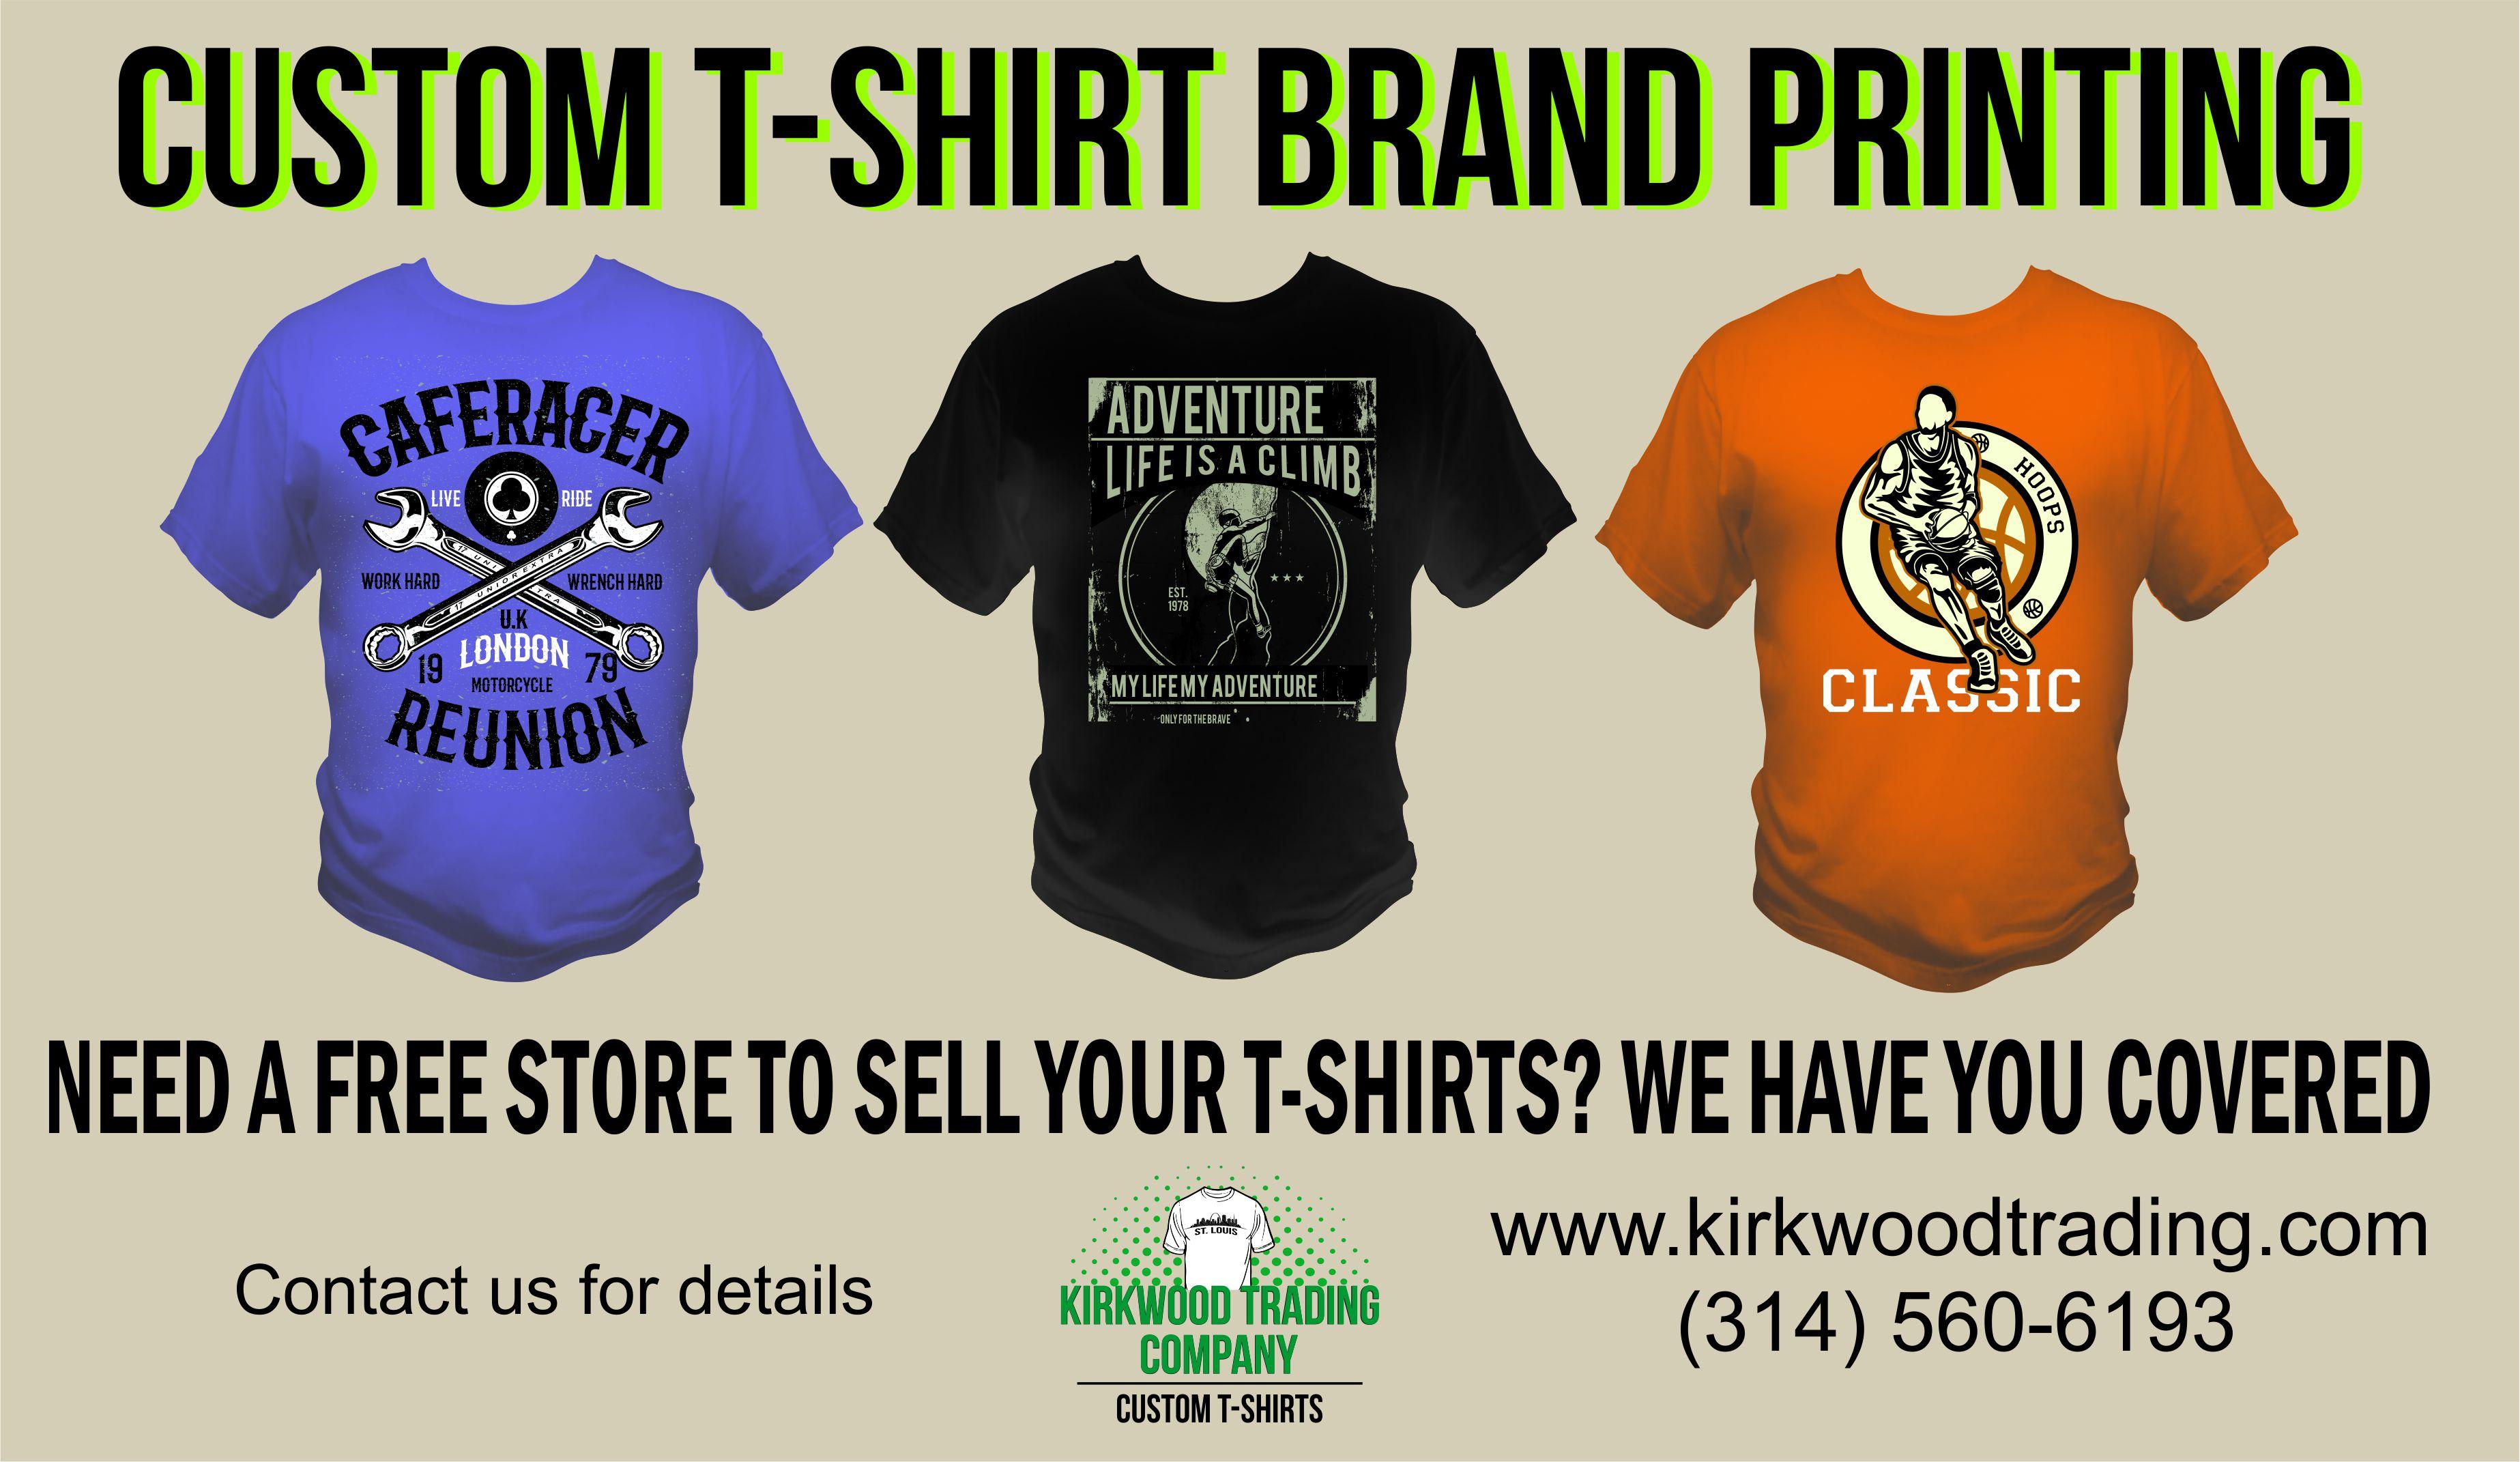 Custom t shirt brand printing company kirkwood trading for Companies that make custom shirts